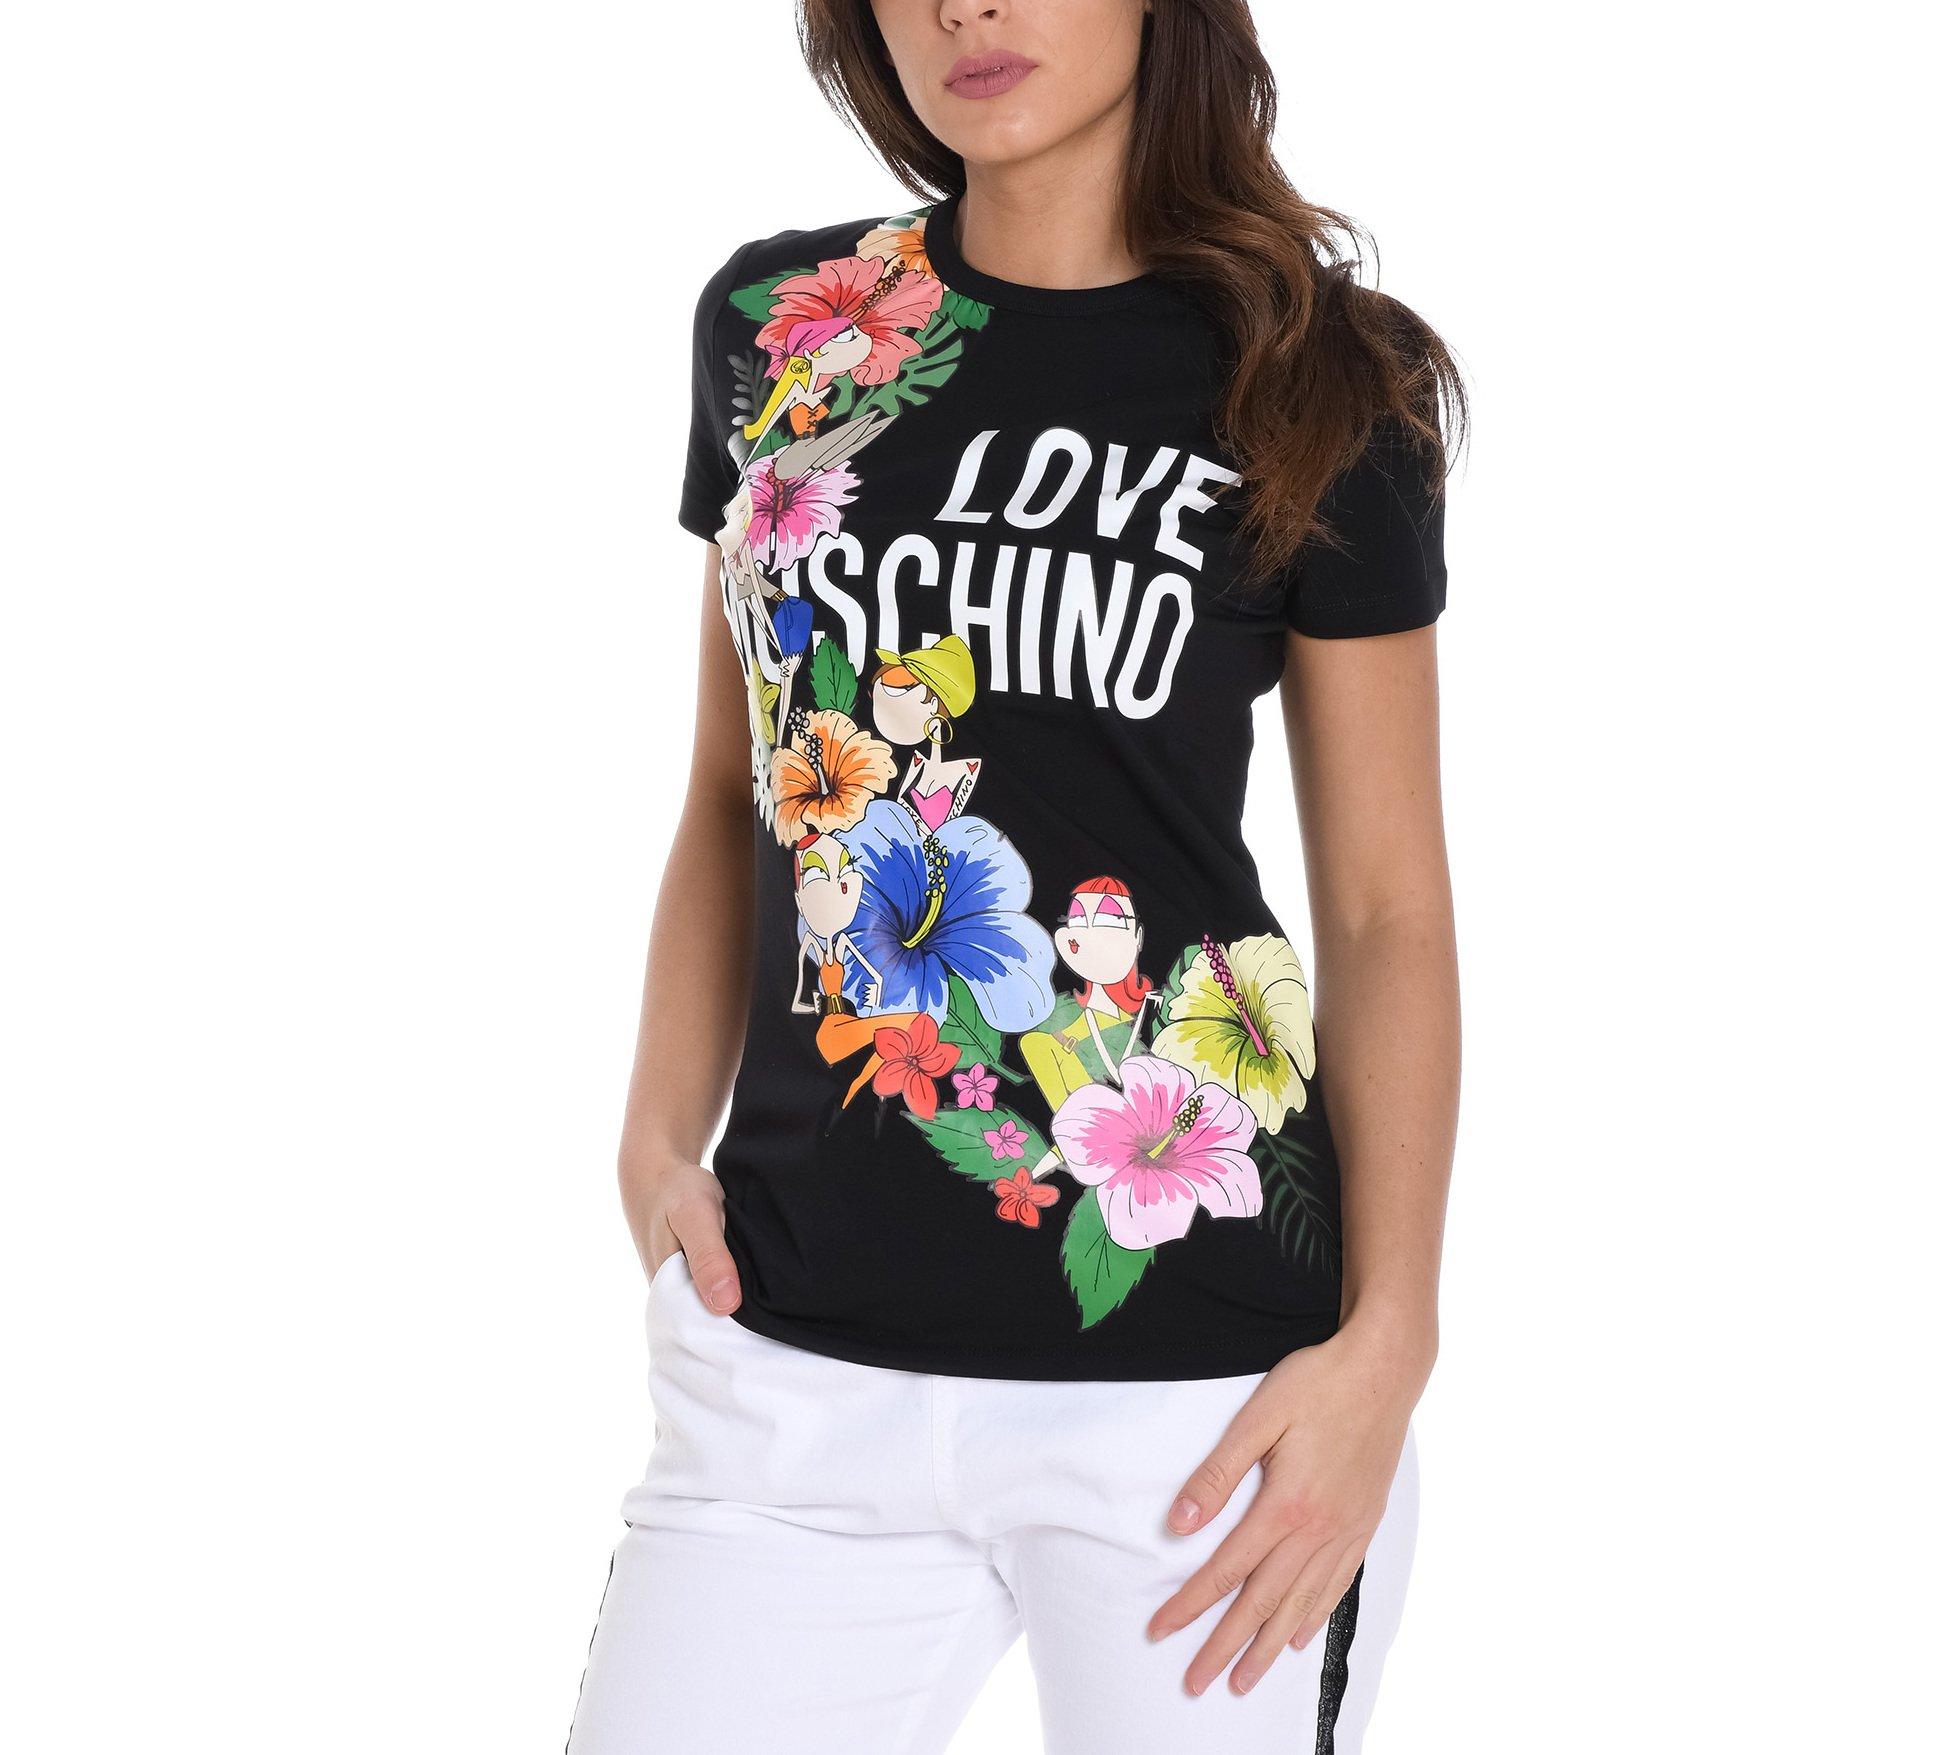 Love Moschino Women's W4f7330e1907c74 Black Cotton T-Shirt